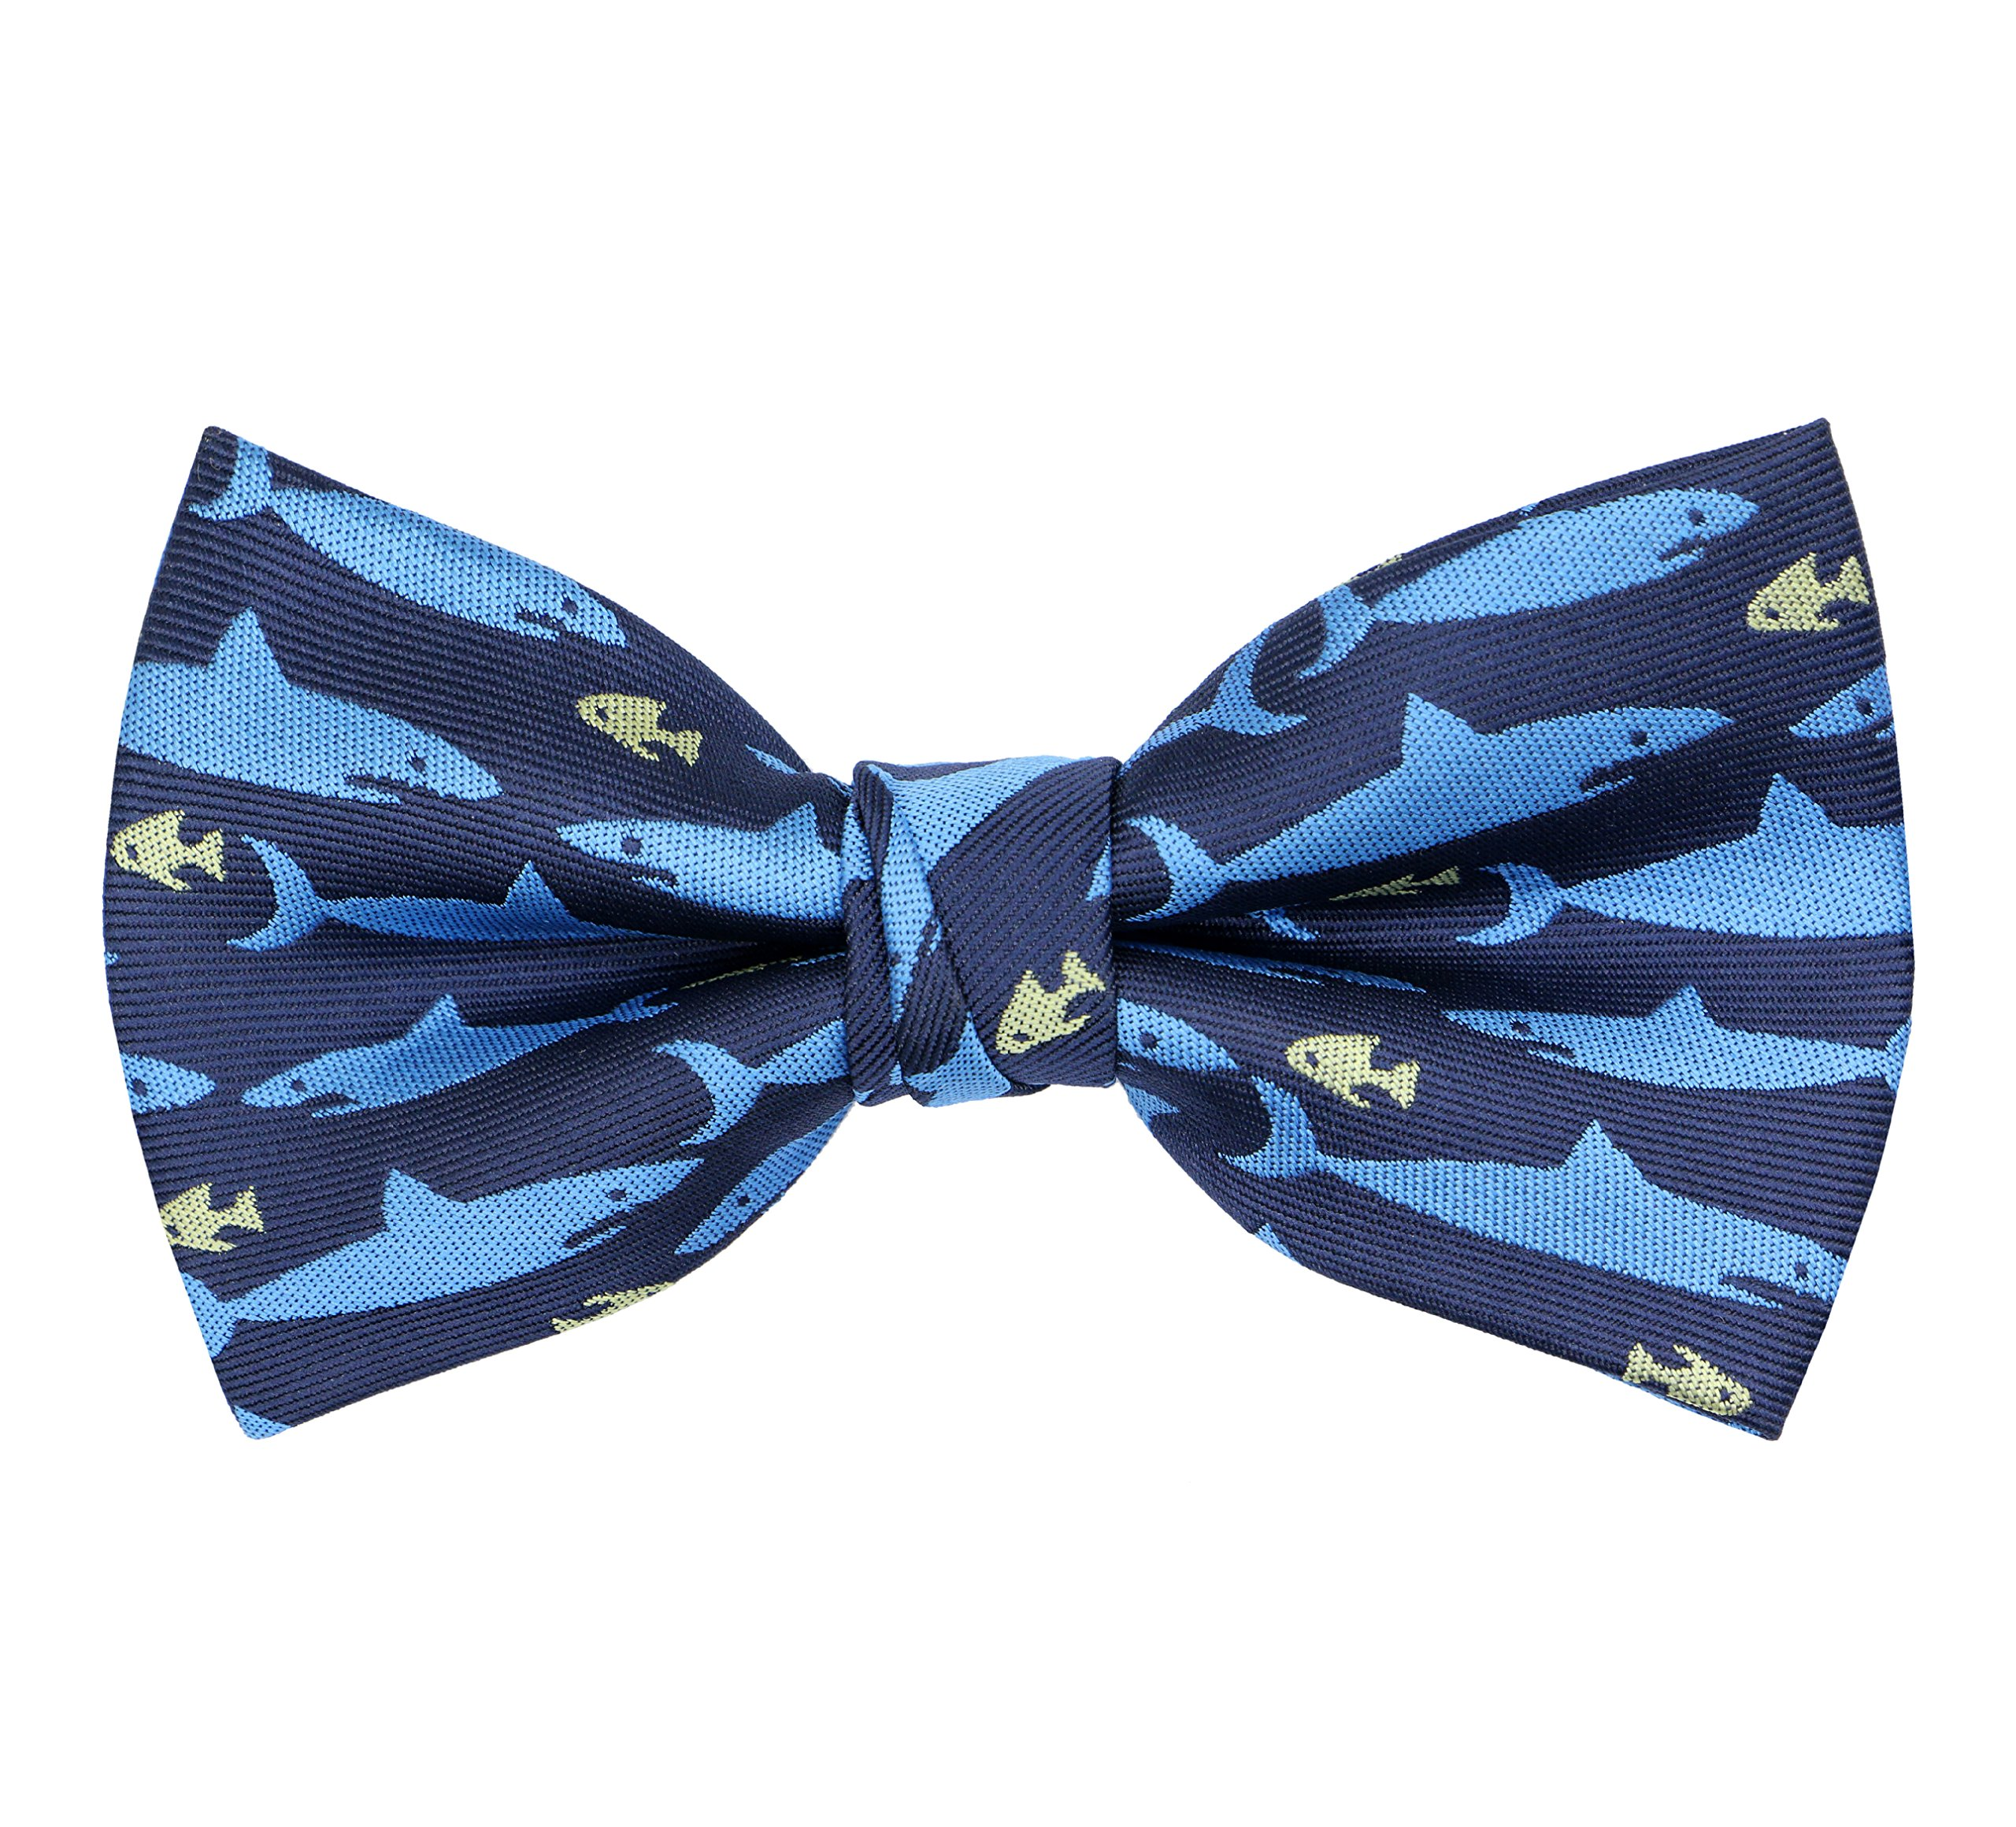 OCIA Boys Pattern Bow Ties Kids Tuxedo Pre-tied Bowties Party & Wedding Blue Shark